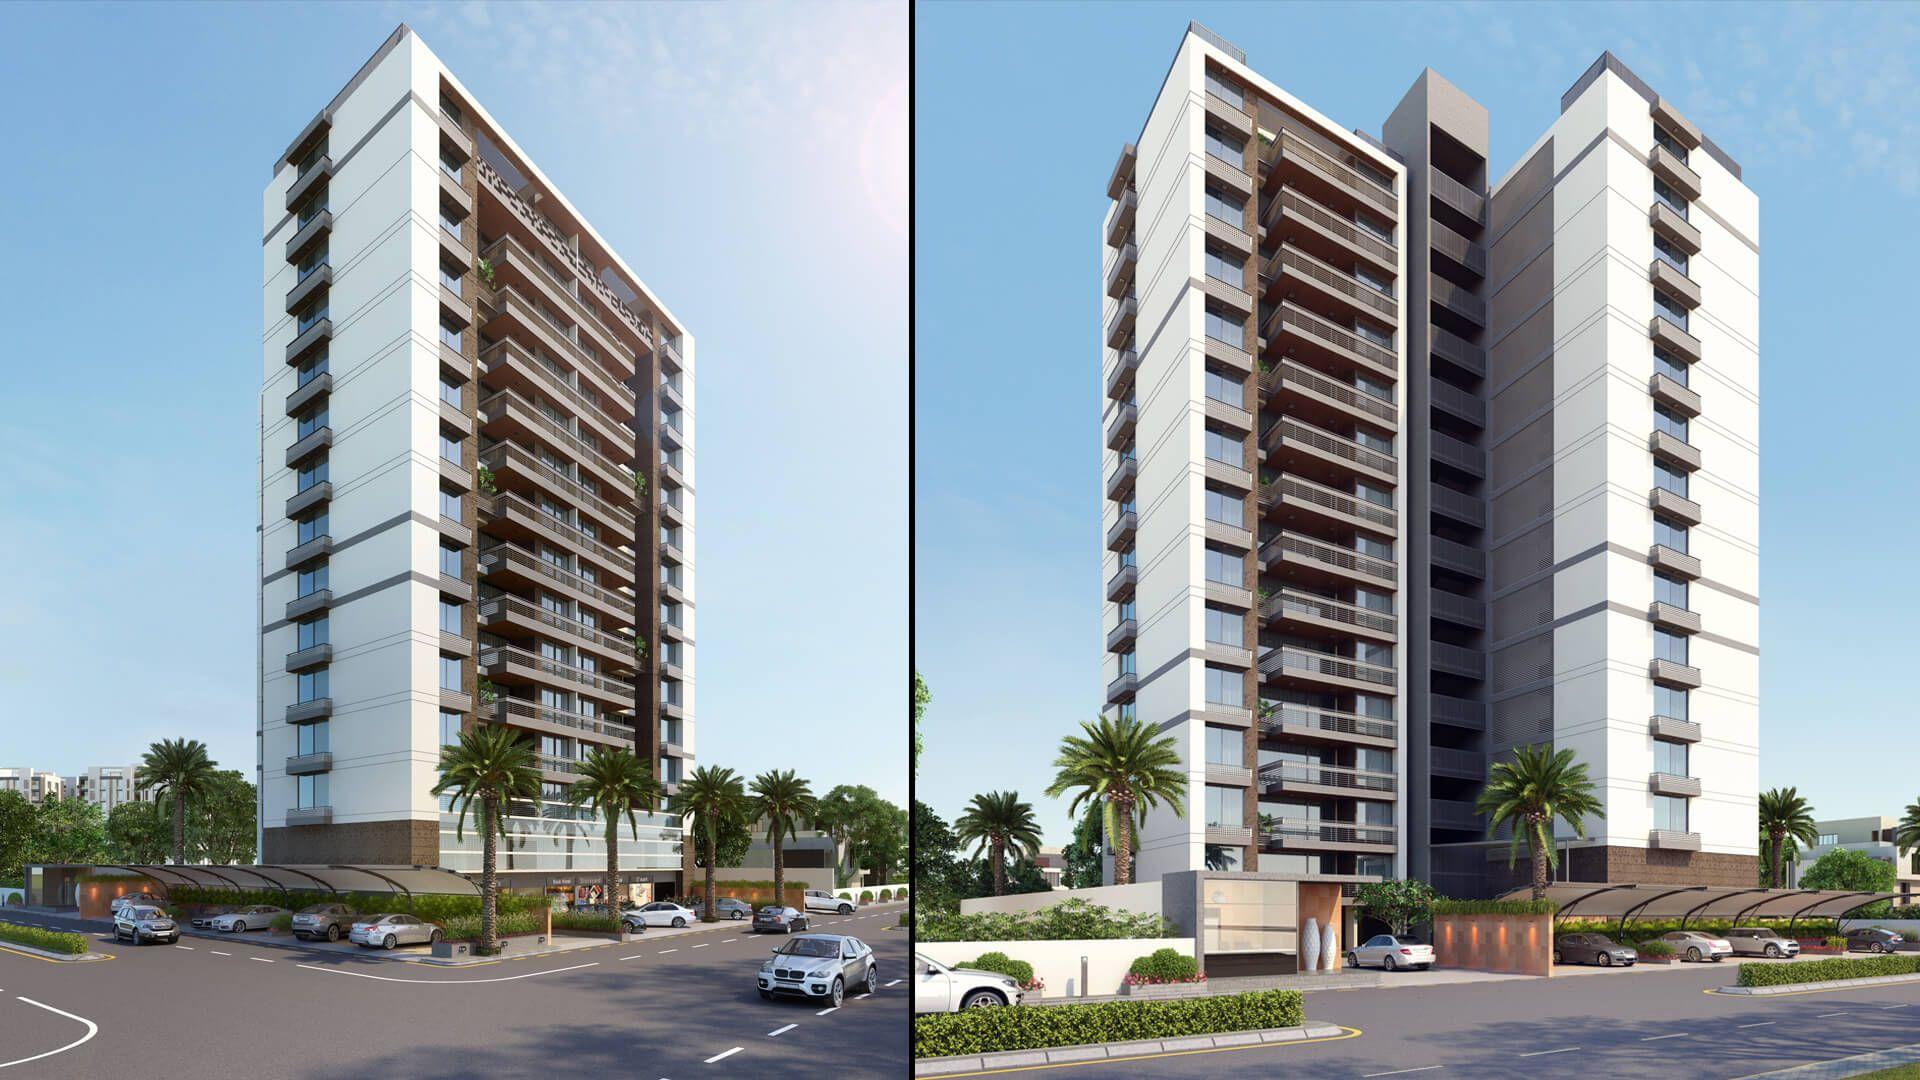 Exterior: 3D HI-Rise Building Exterior Day View Design